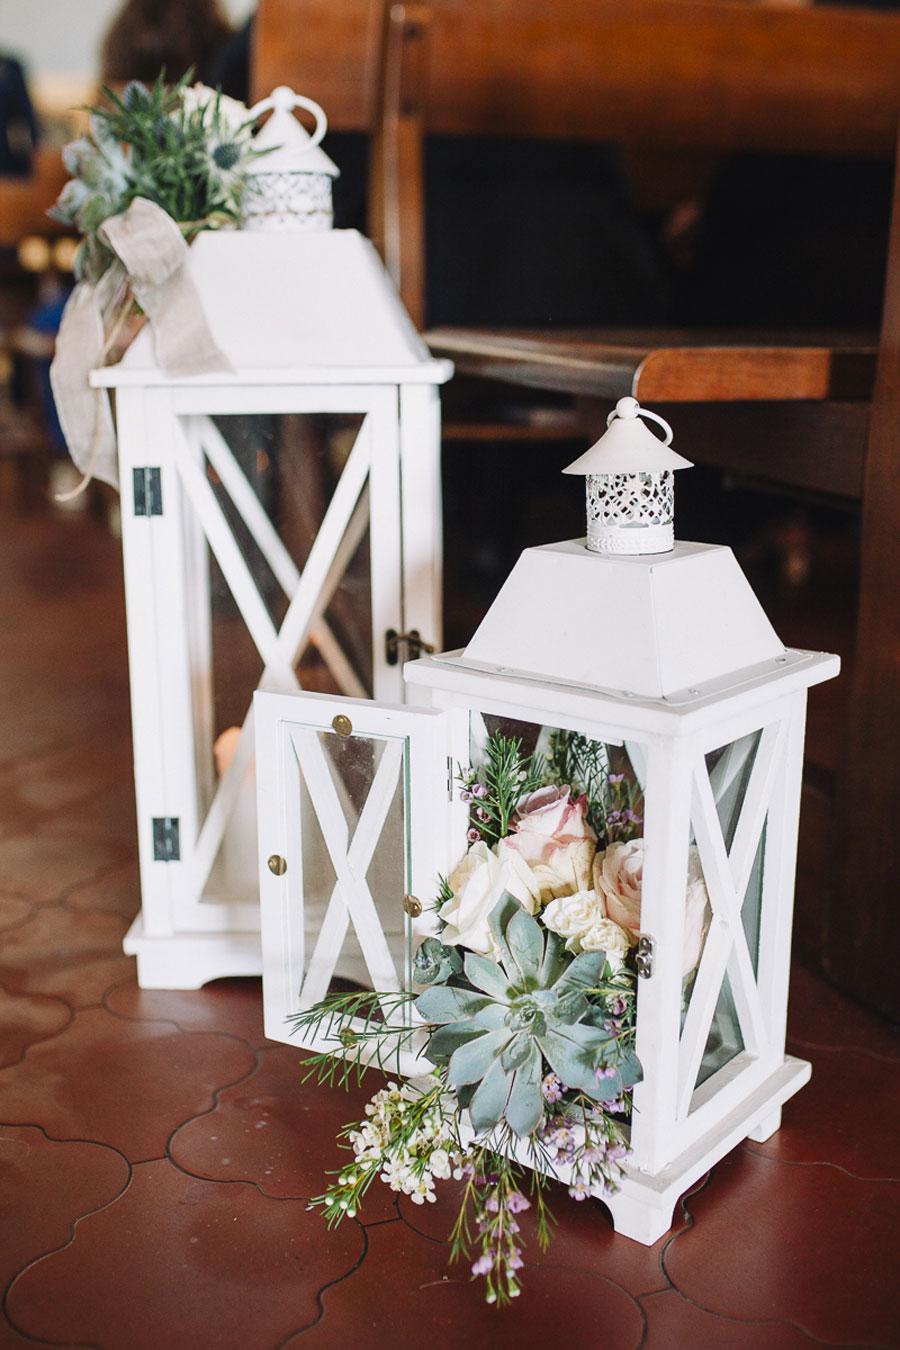 Wedding-Nicholad-and-Federica-Giuseppe-Giovannelli-154